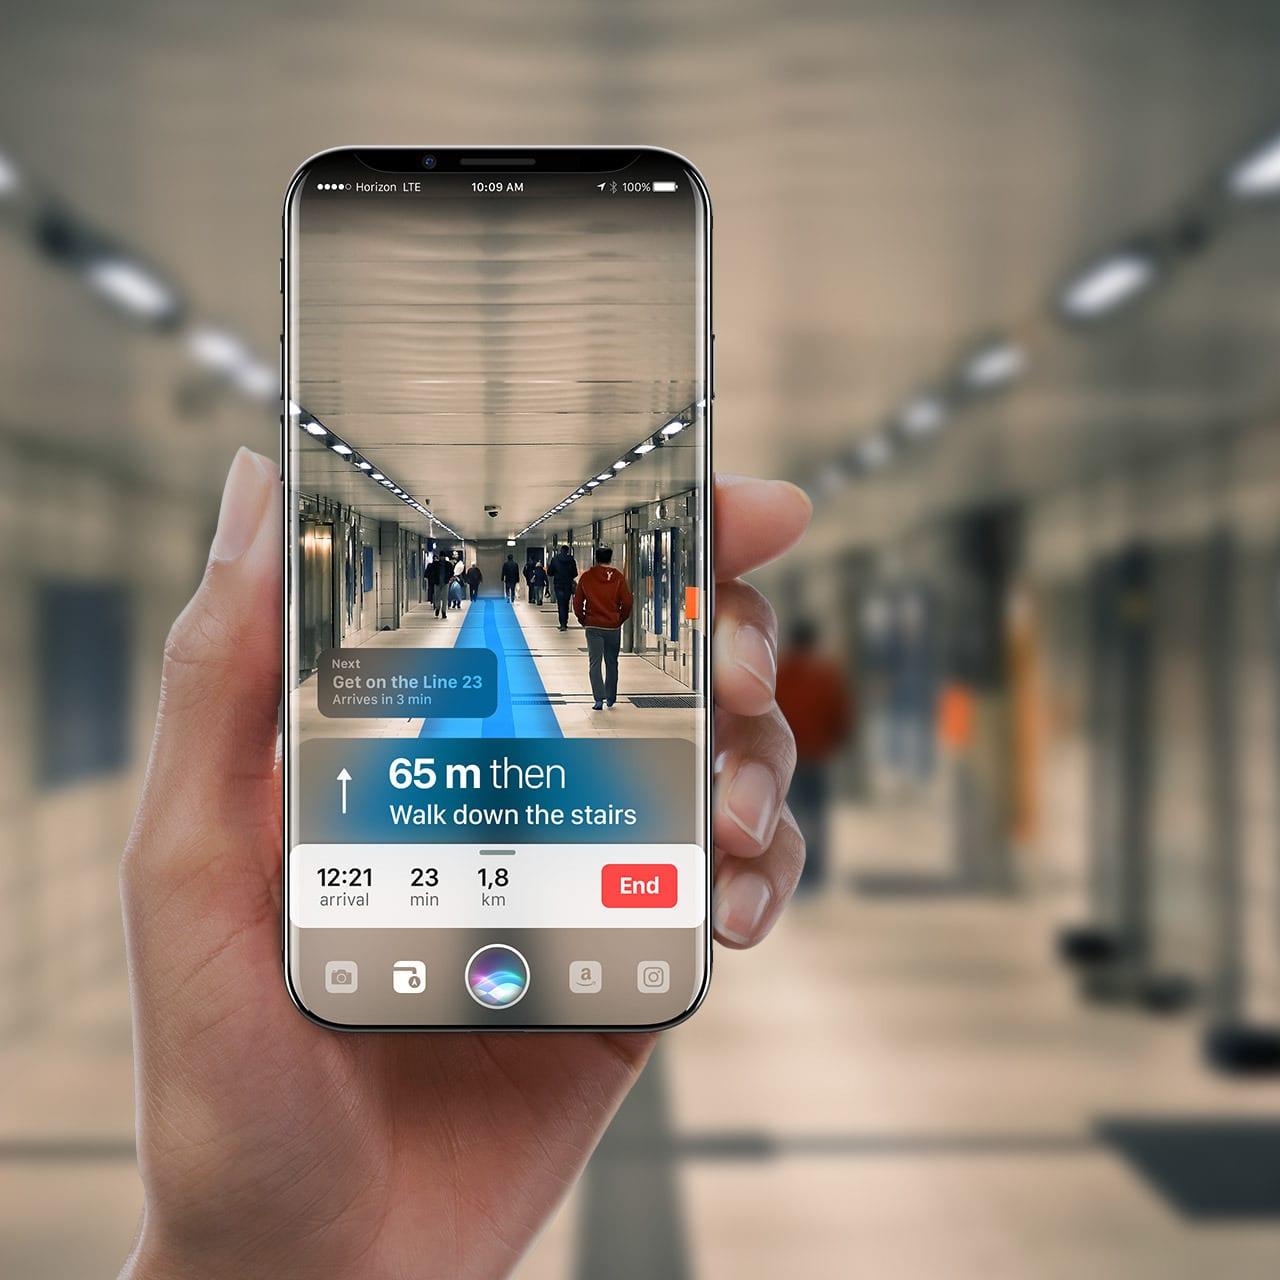 iphone 8 concept ios 11 gabor balogh 3 - Apple si od Samsungu objednal 70  miliónov da71a436efc